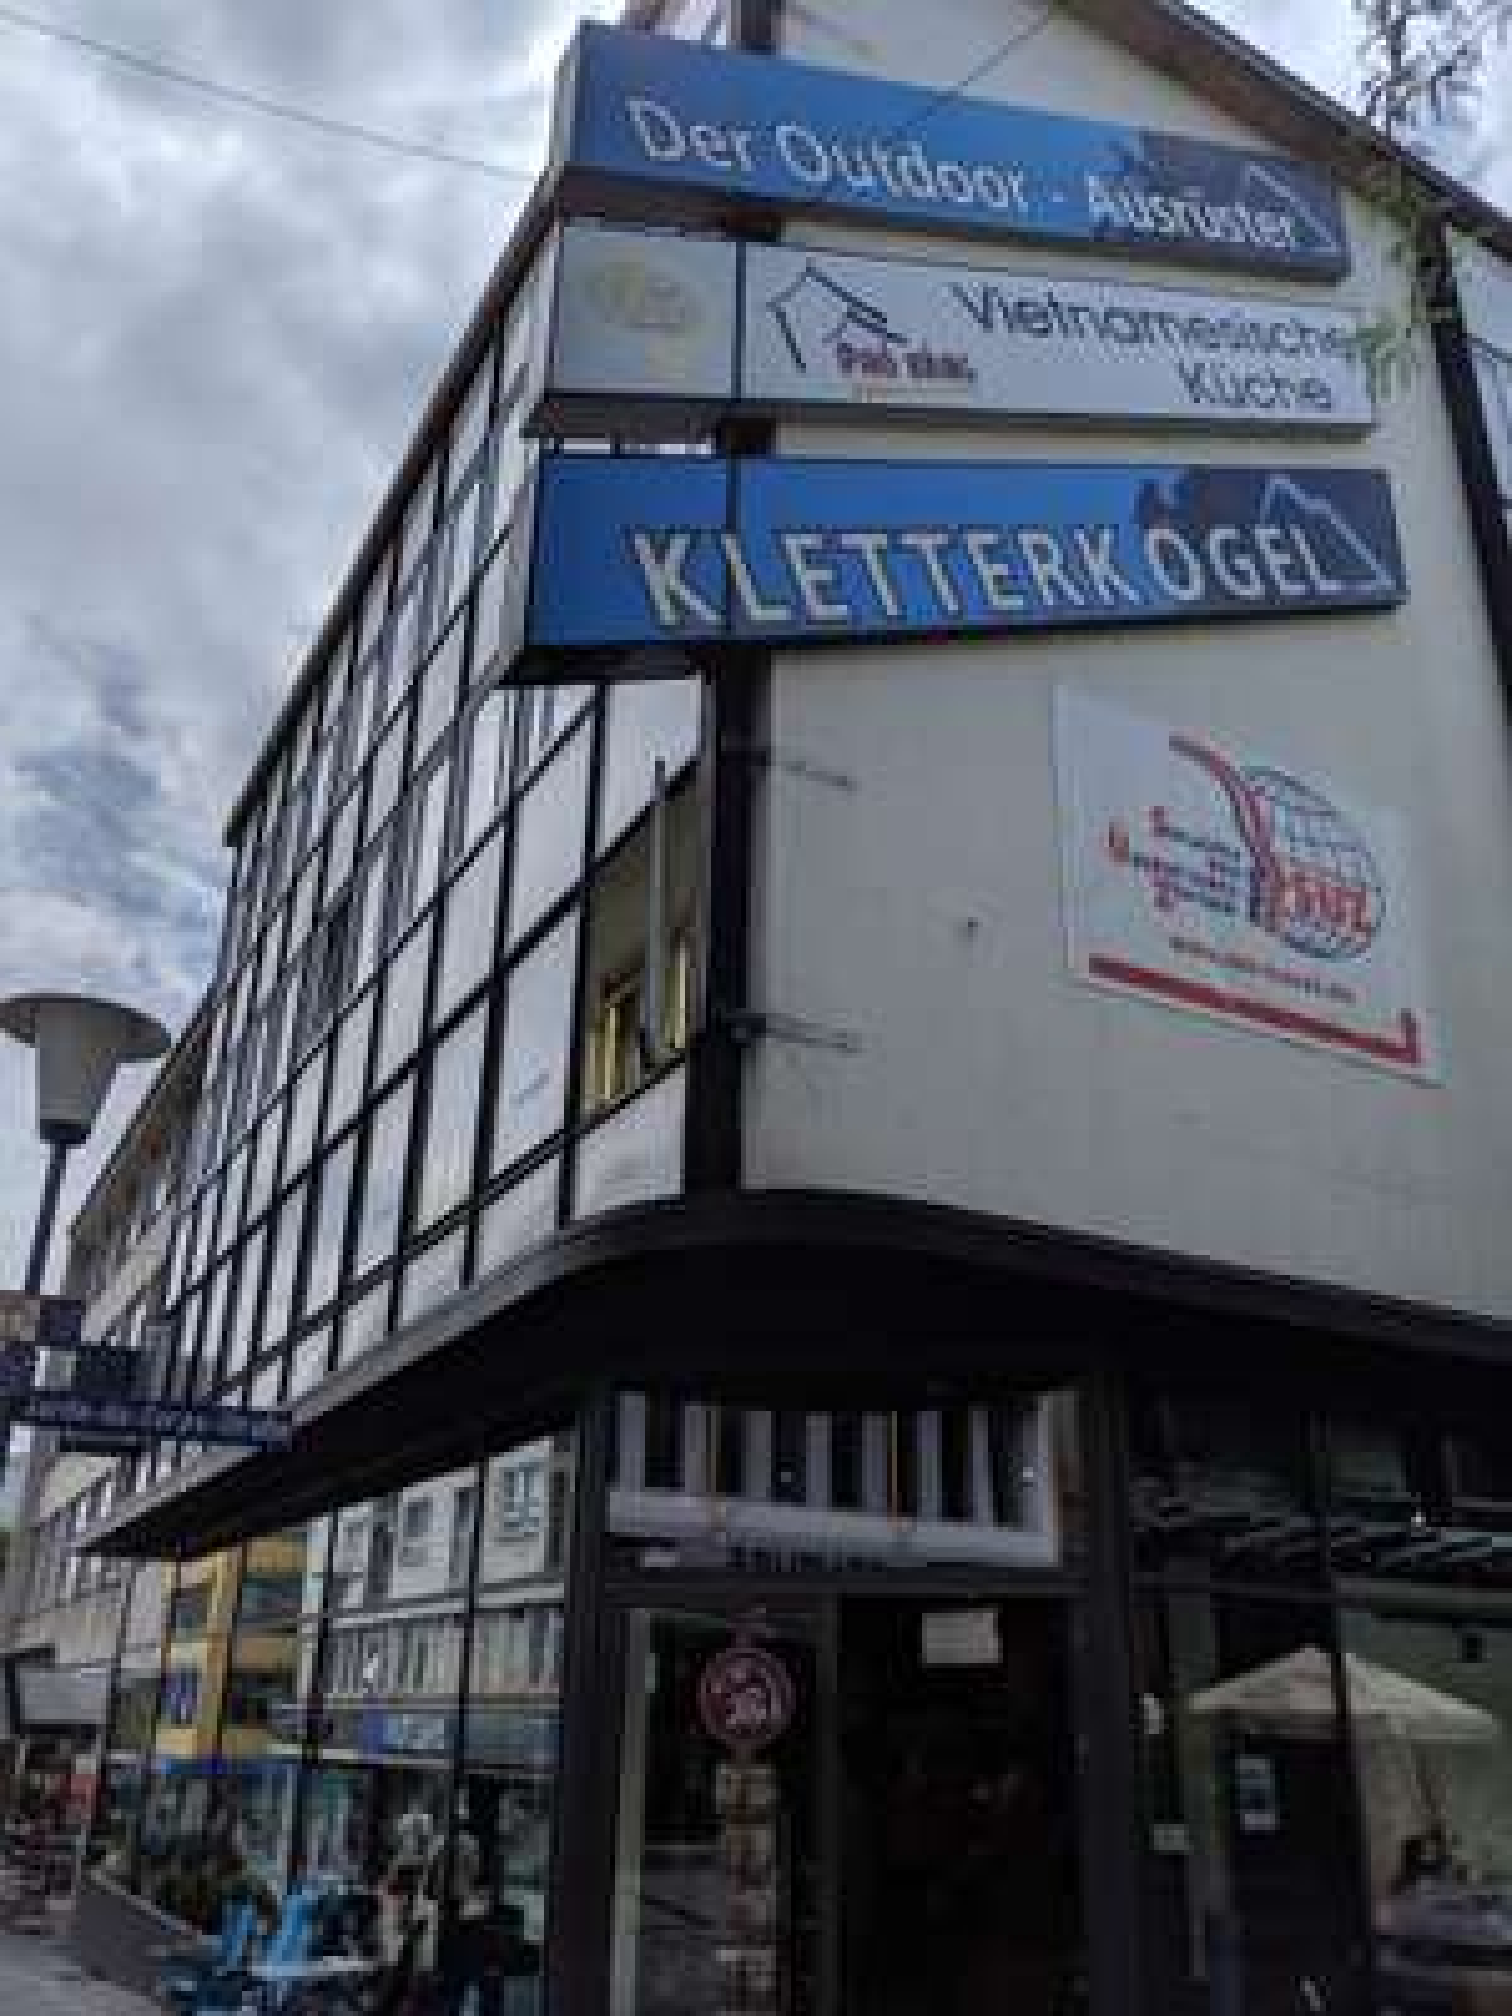 [Lokal Kassel] Kletterkogel 20% SSV auf alles